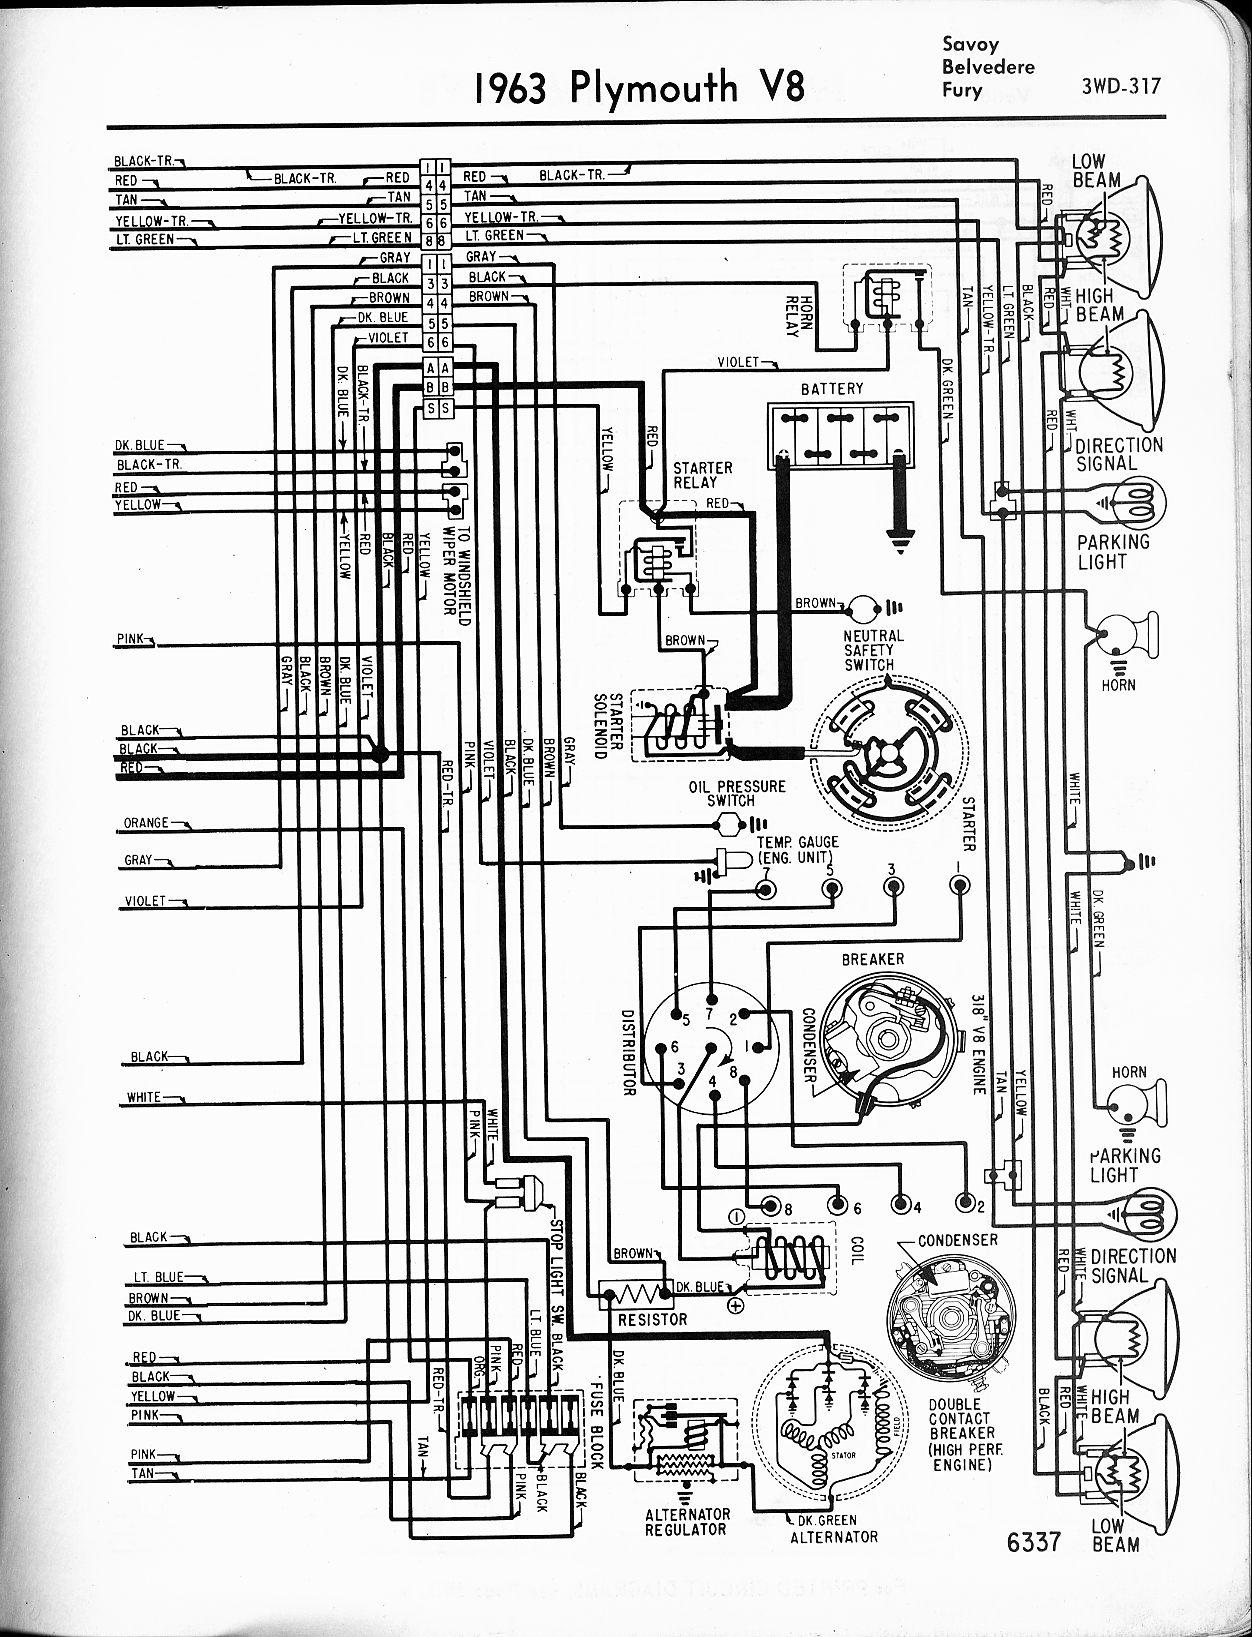 old fuse box wiring diagram yamaha raptor 700 headlight chrysler valiant library